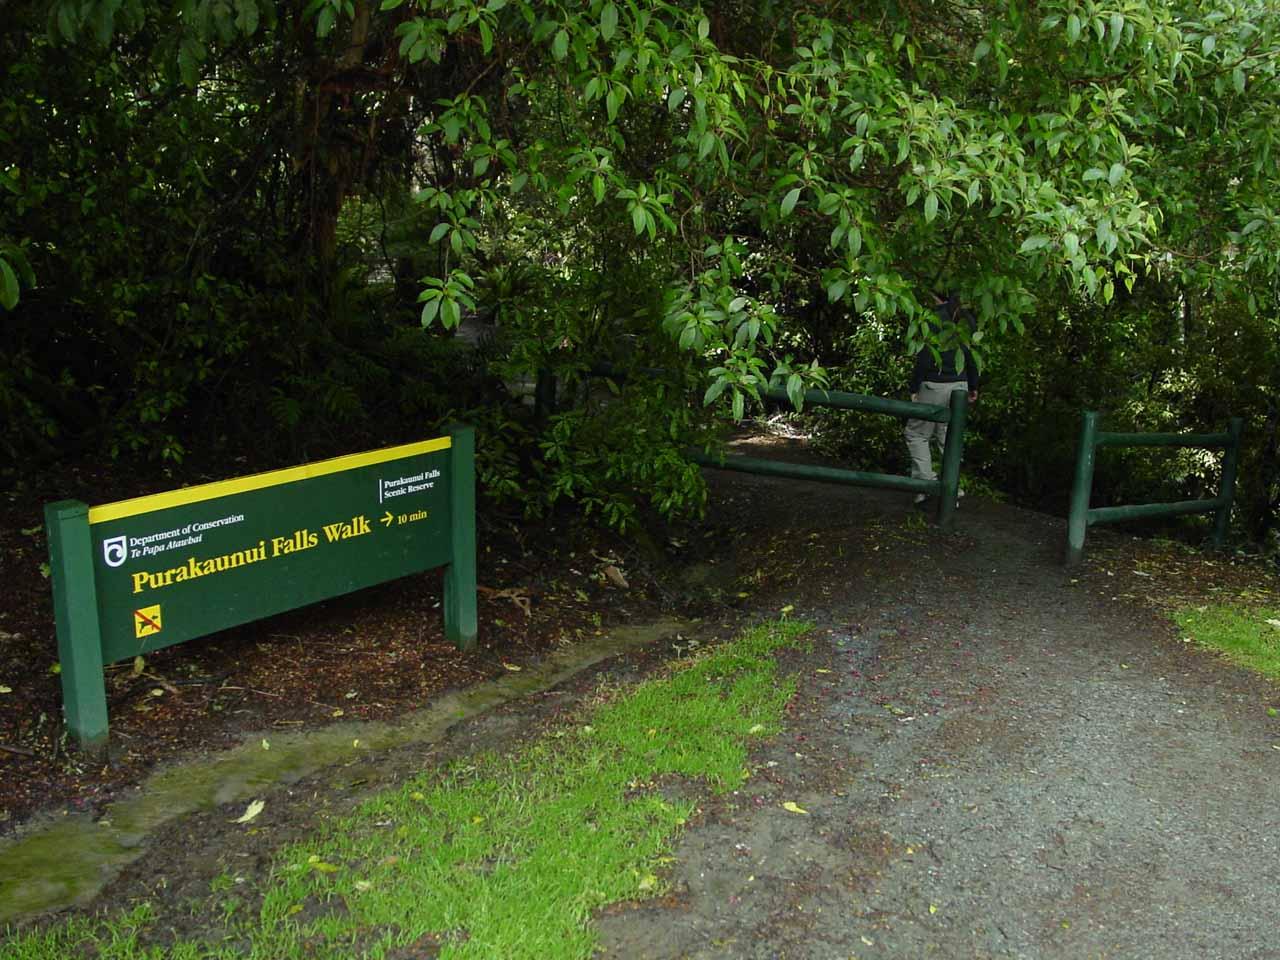 Julie going past the signposted trailhead for Purakaunui Falls